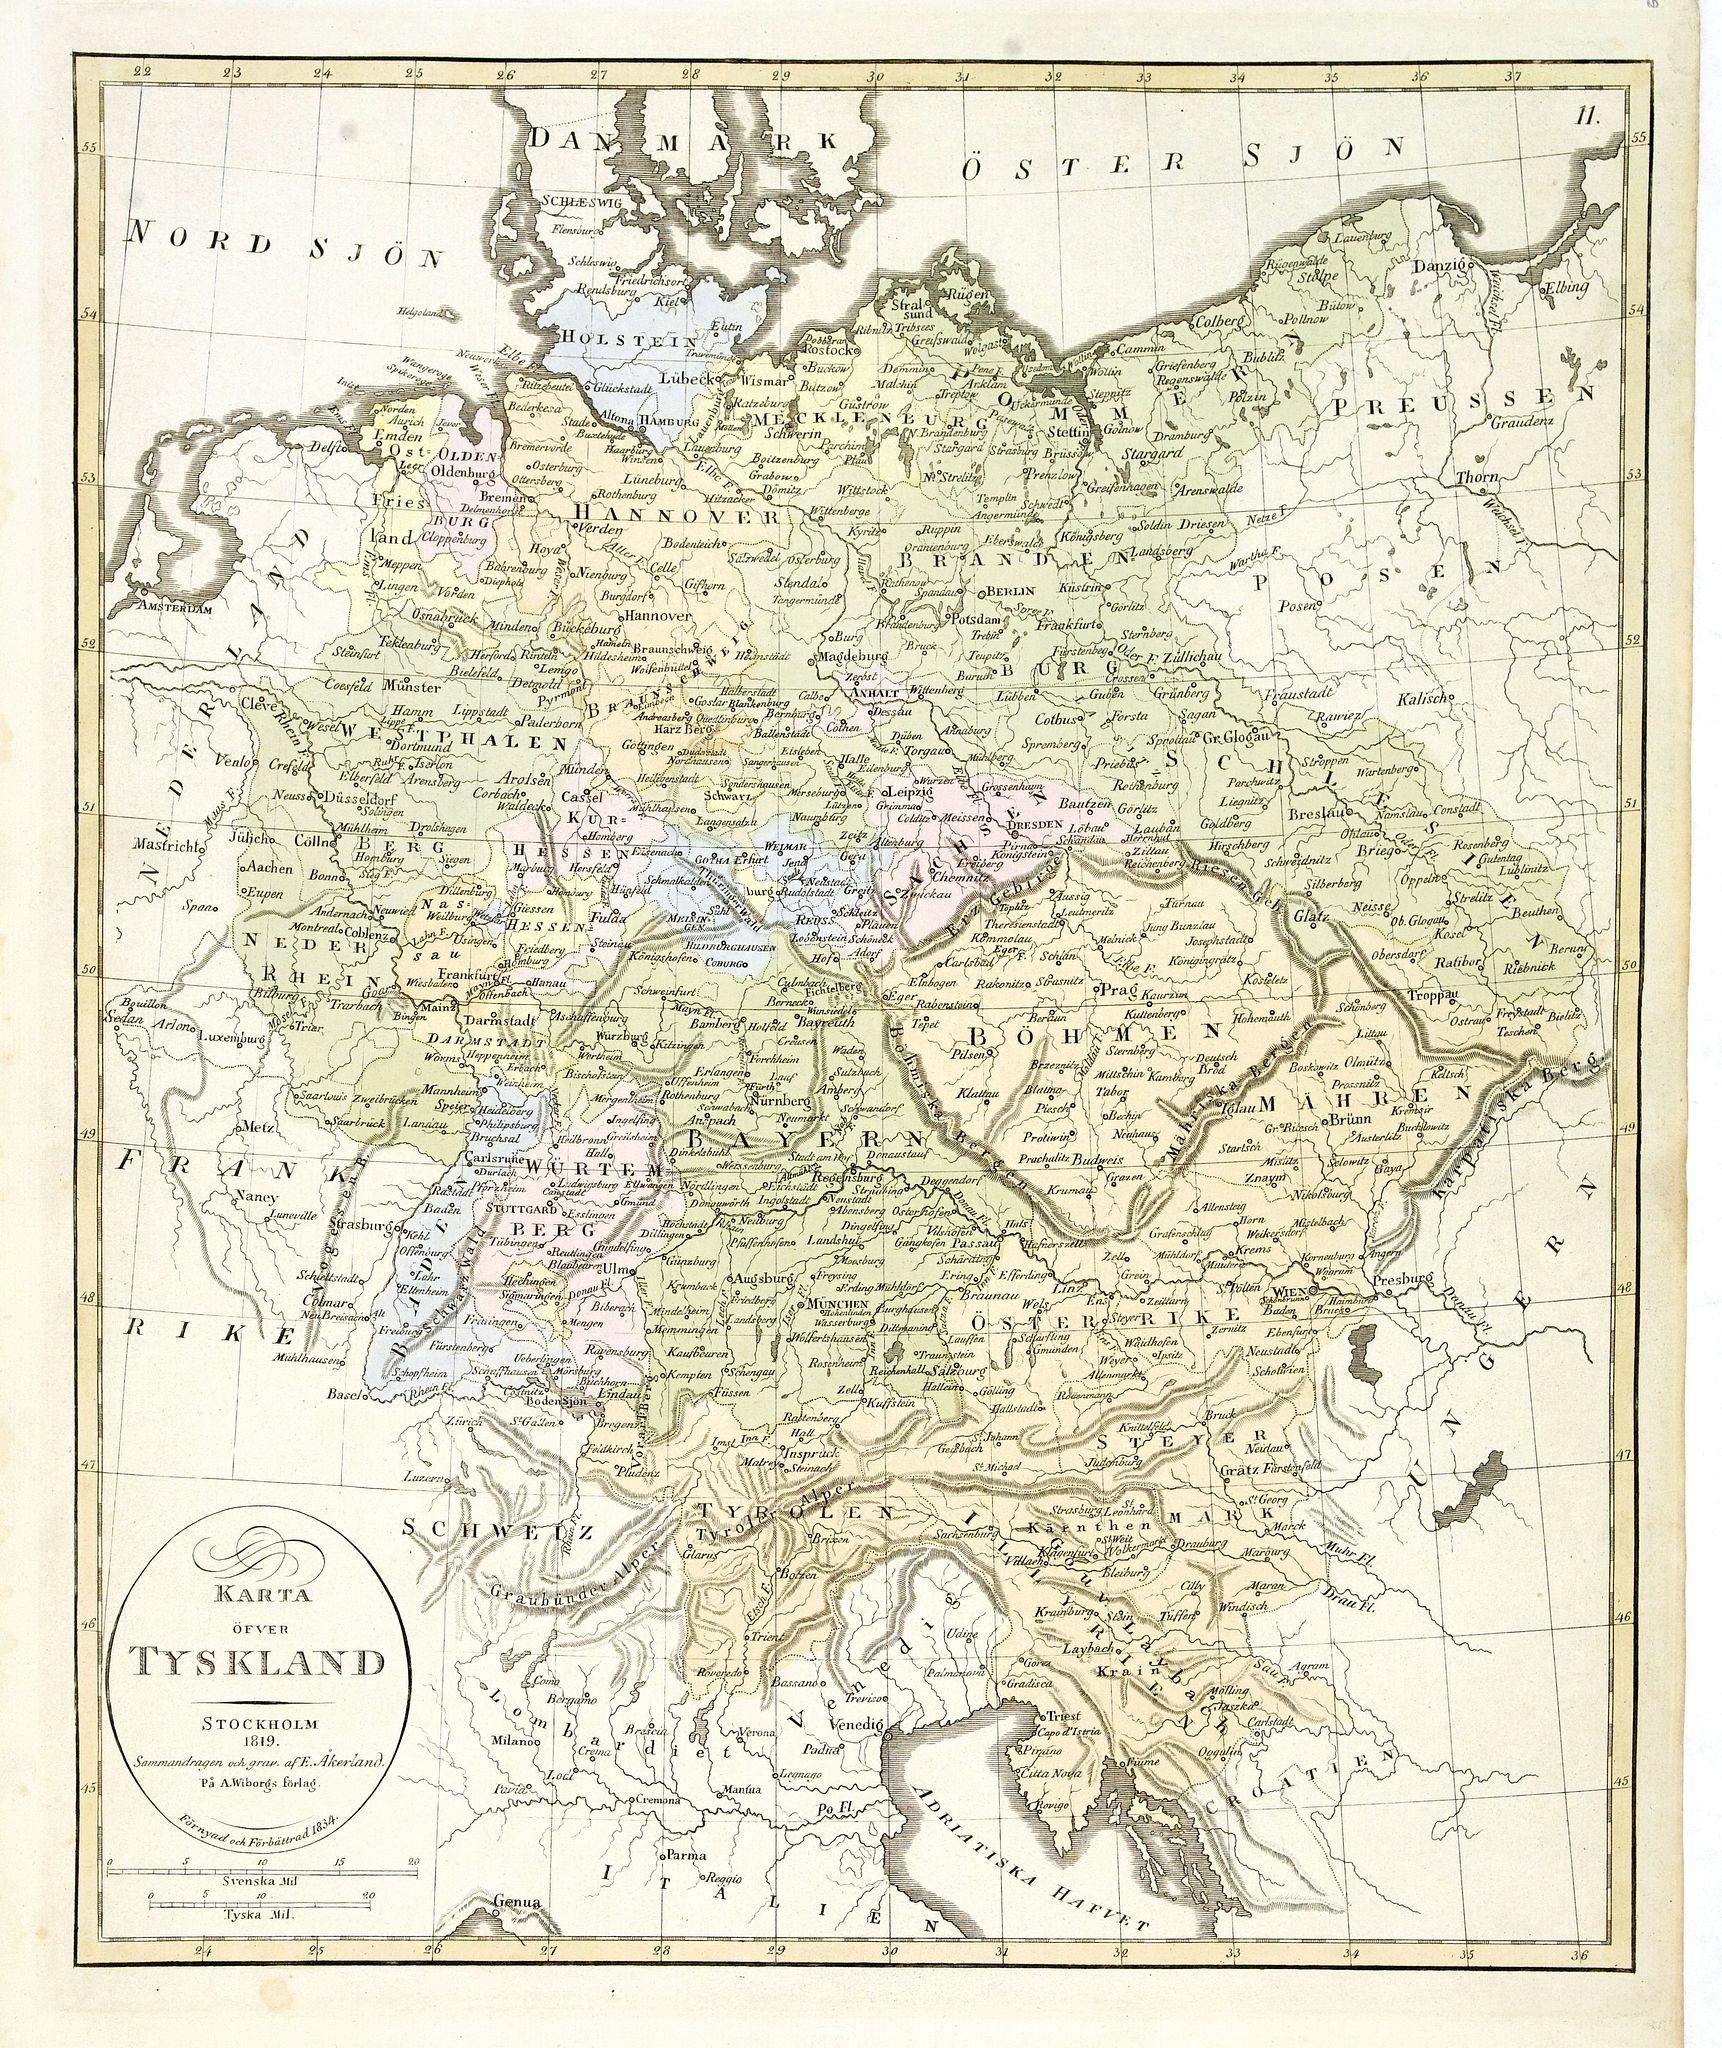 ÅKERLAND, E -  Karta öfver Tyskland.